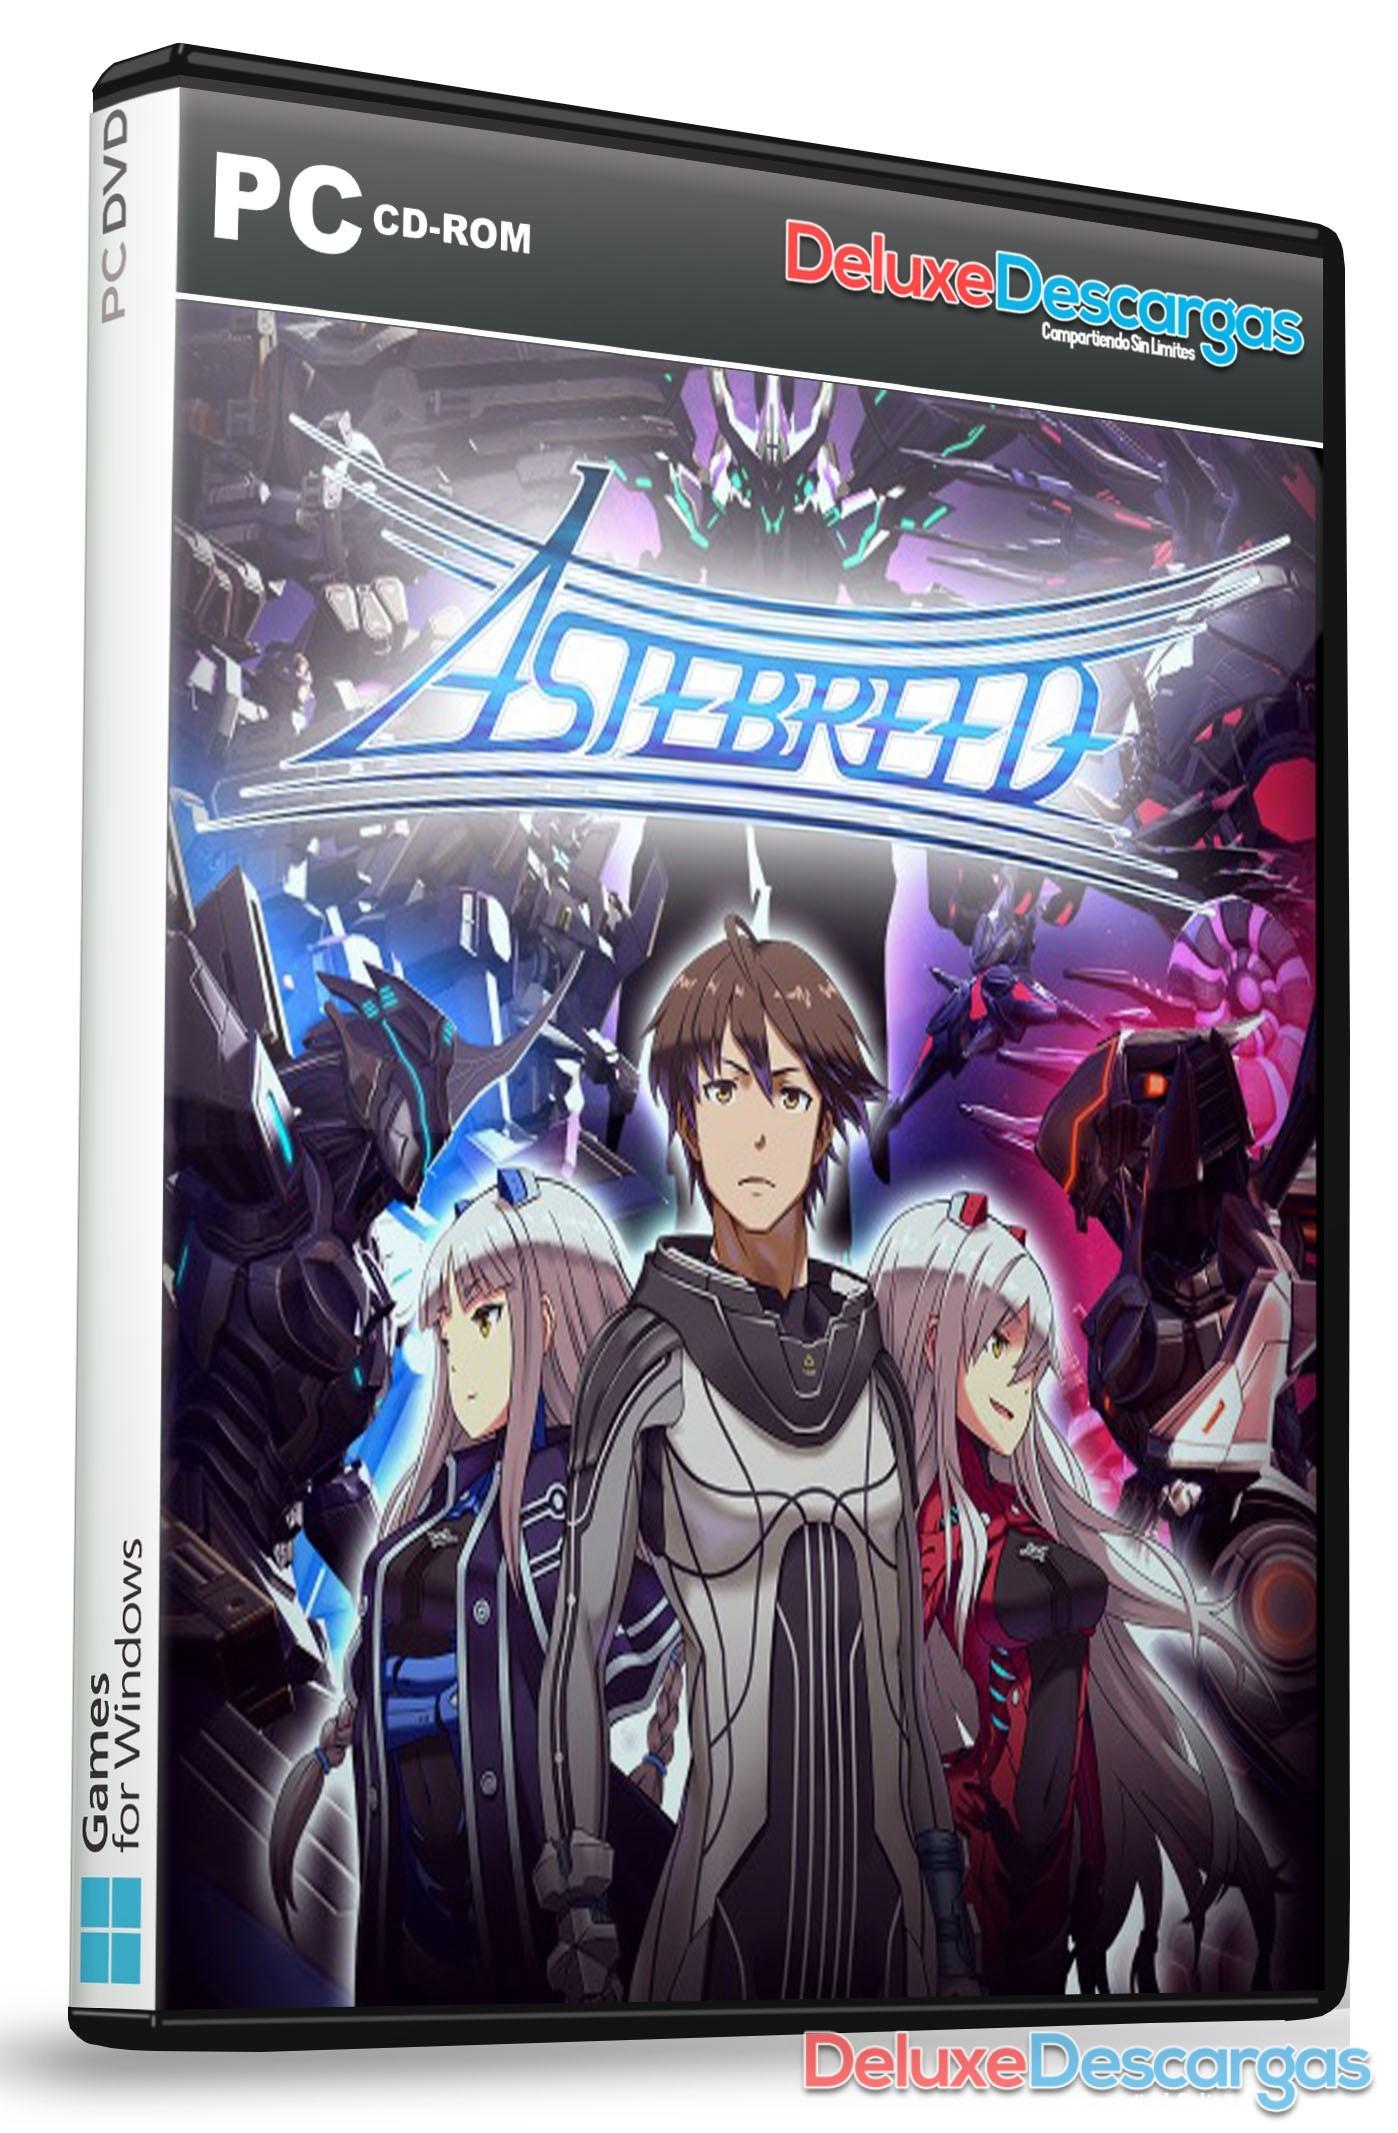 Descargar Astebreed Definitive Edition Ingles Full Pc Game